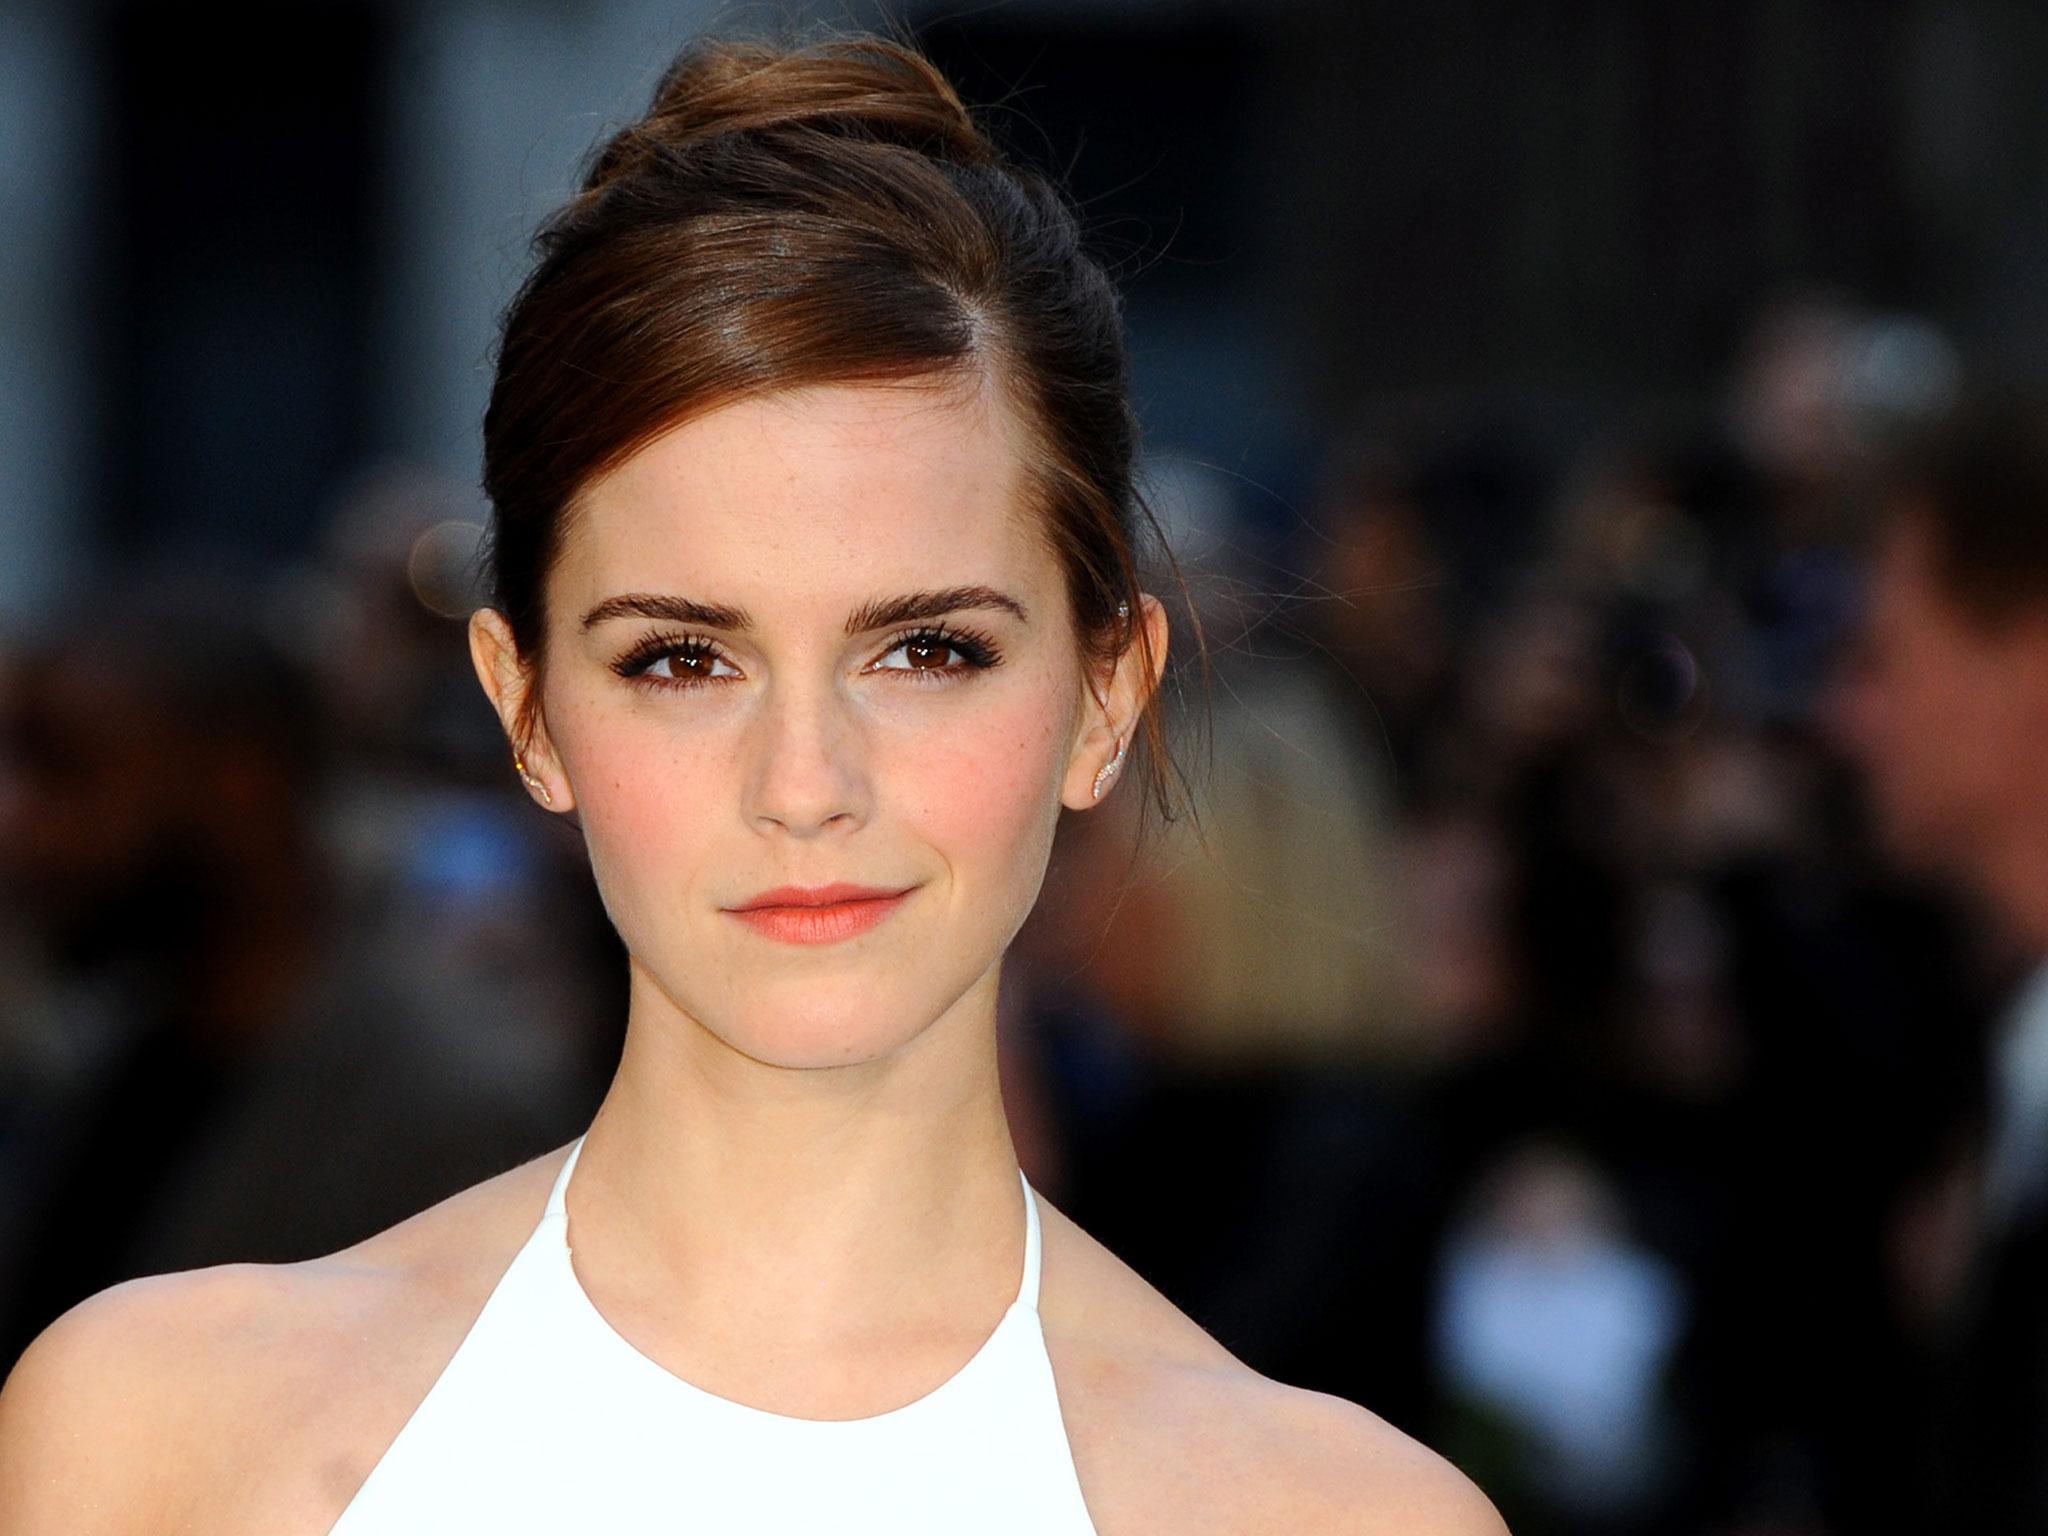 Emma Watson Backgrounds on Wallpapers Vista